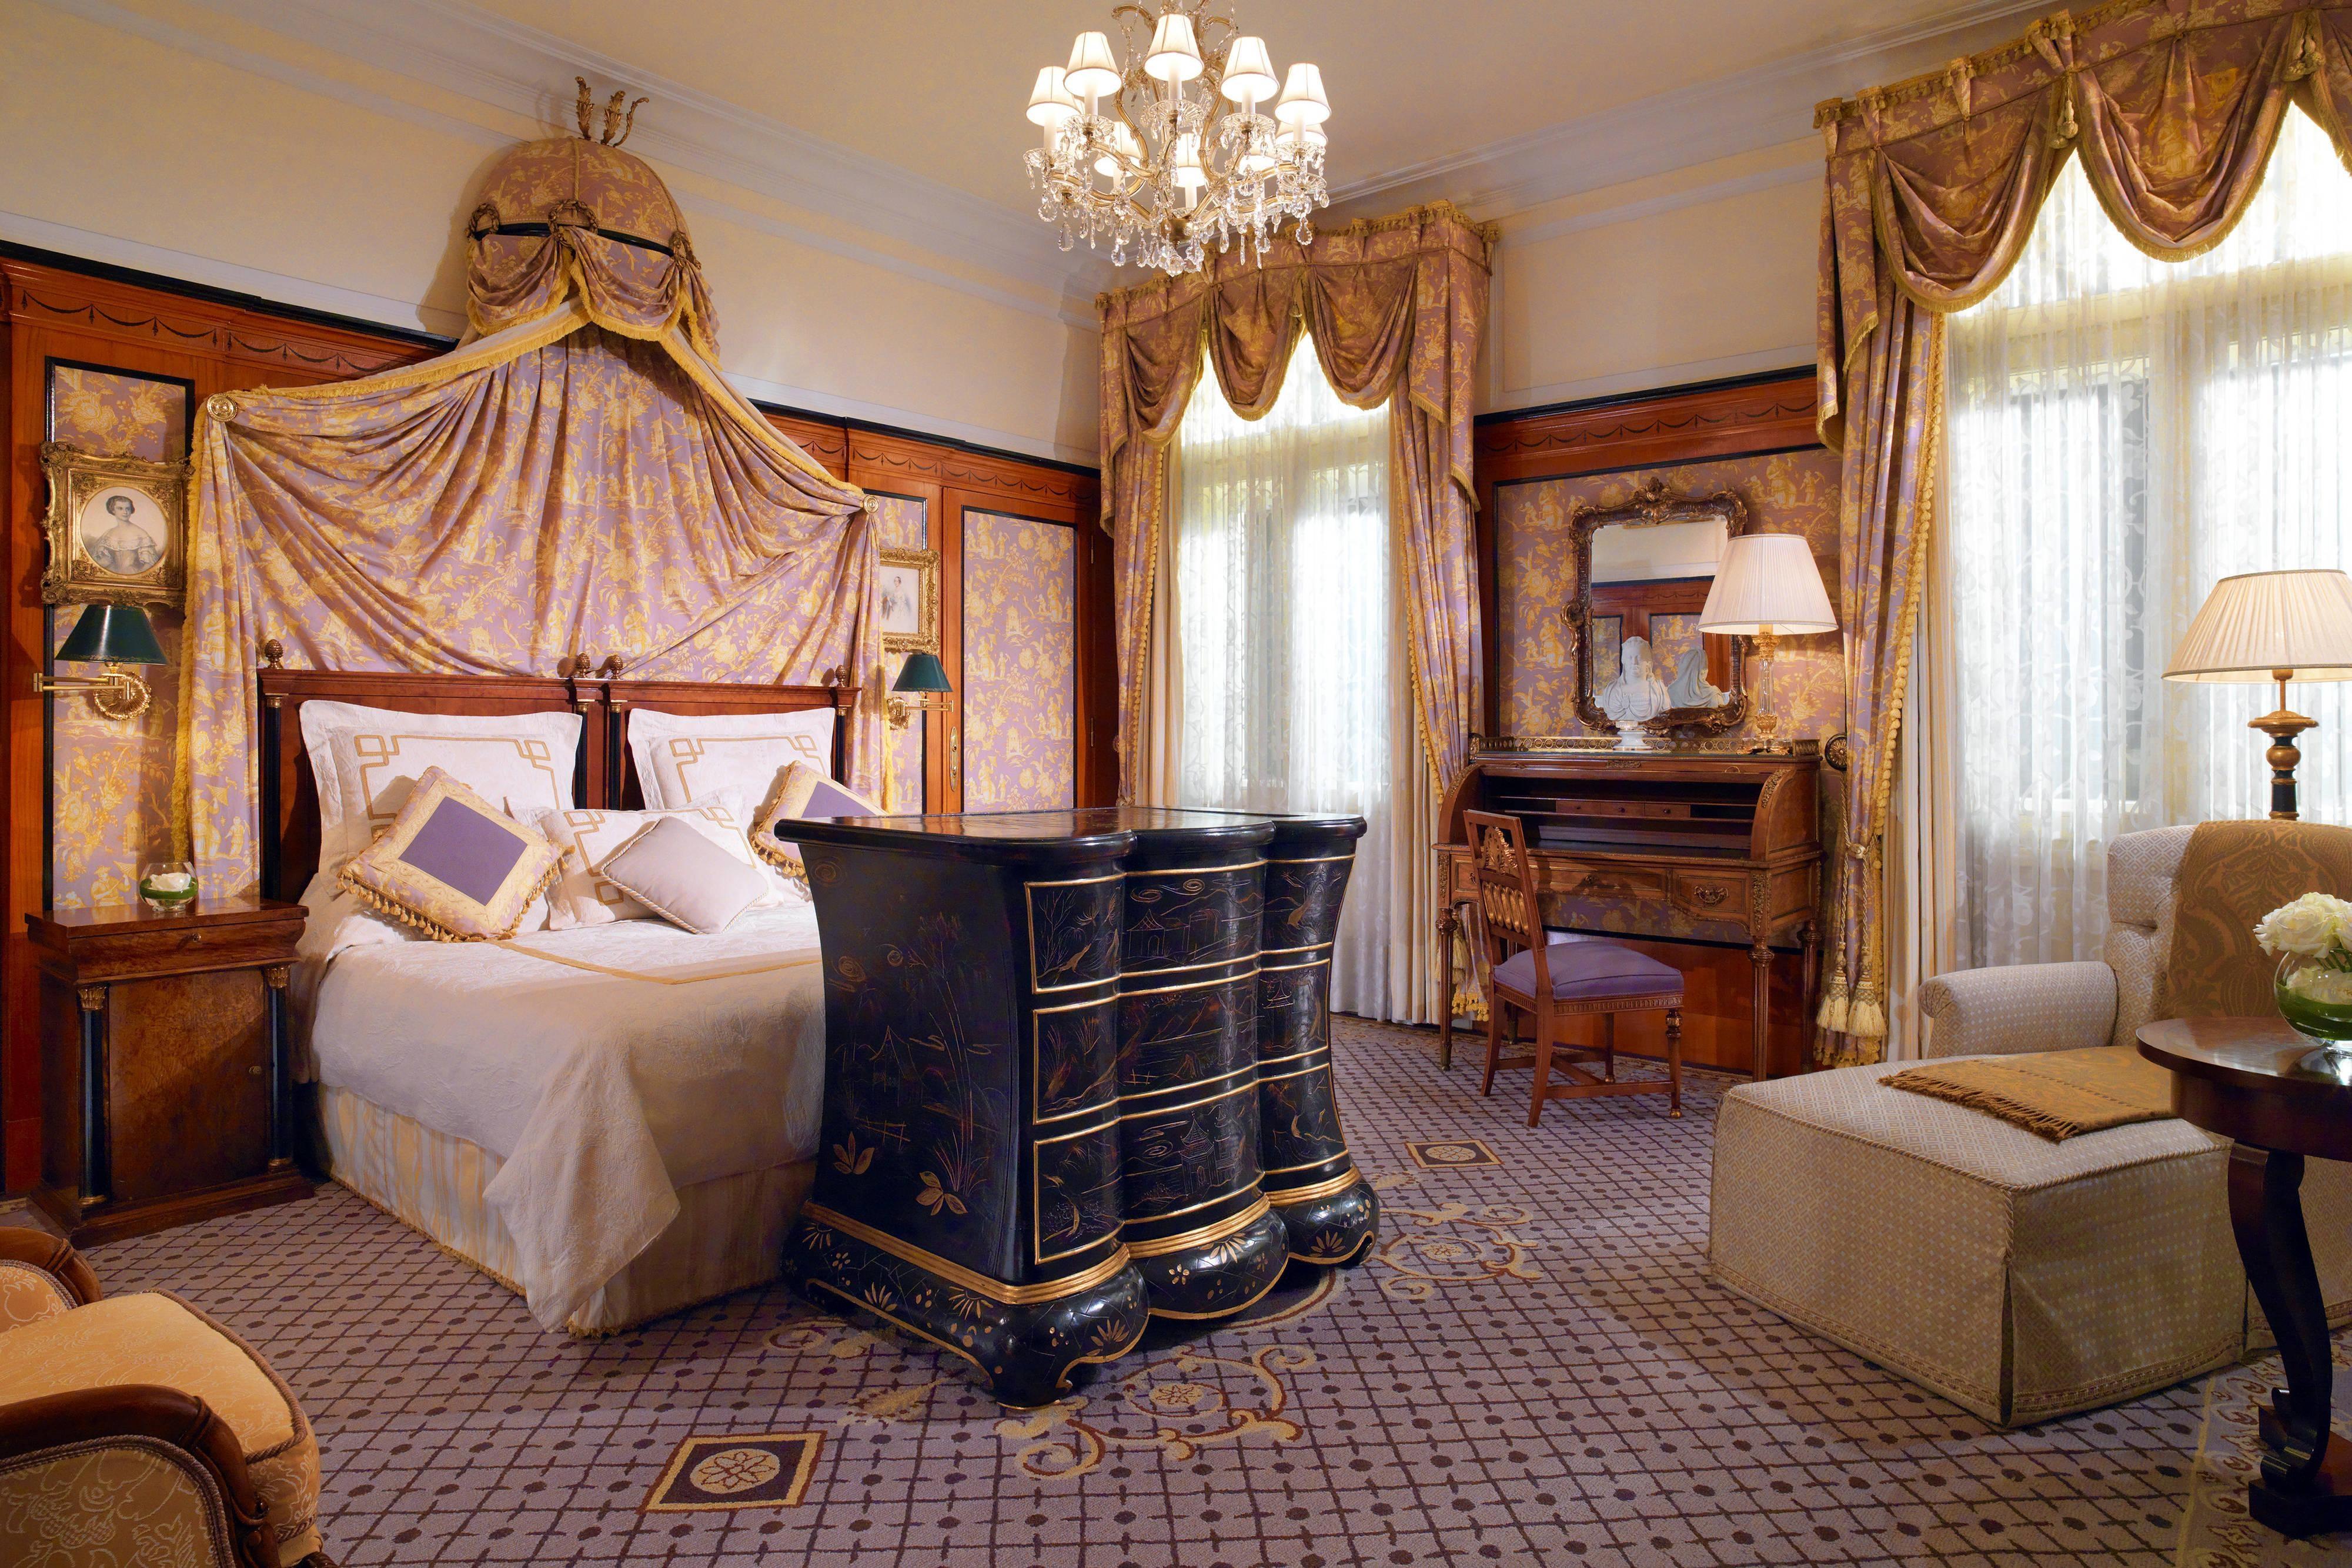 Prince of Wales Suite - Bedroom